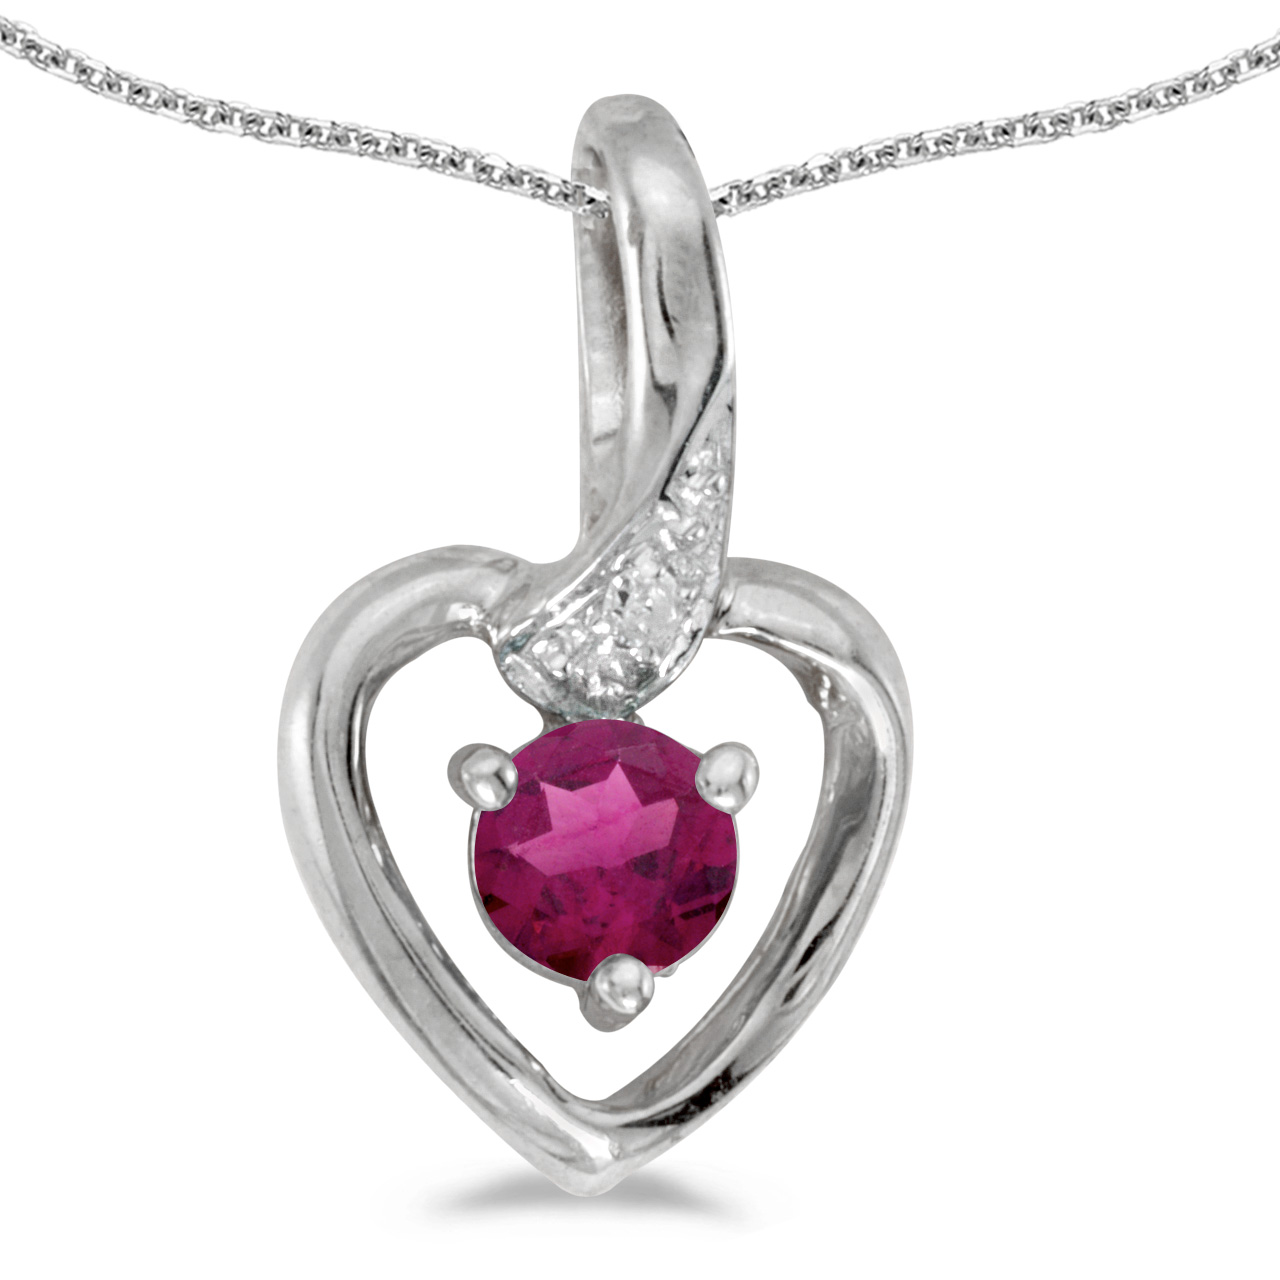 "14k White Gold Round Rhodolite Garnet And Diamond Heart Pendant with 18"" Chain"